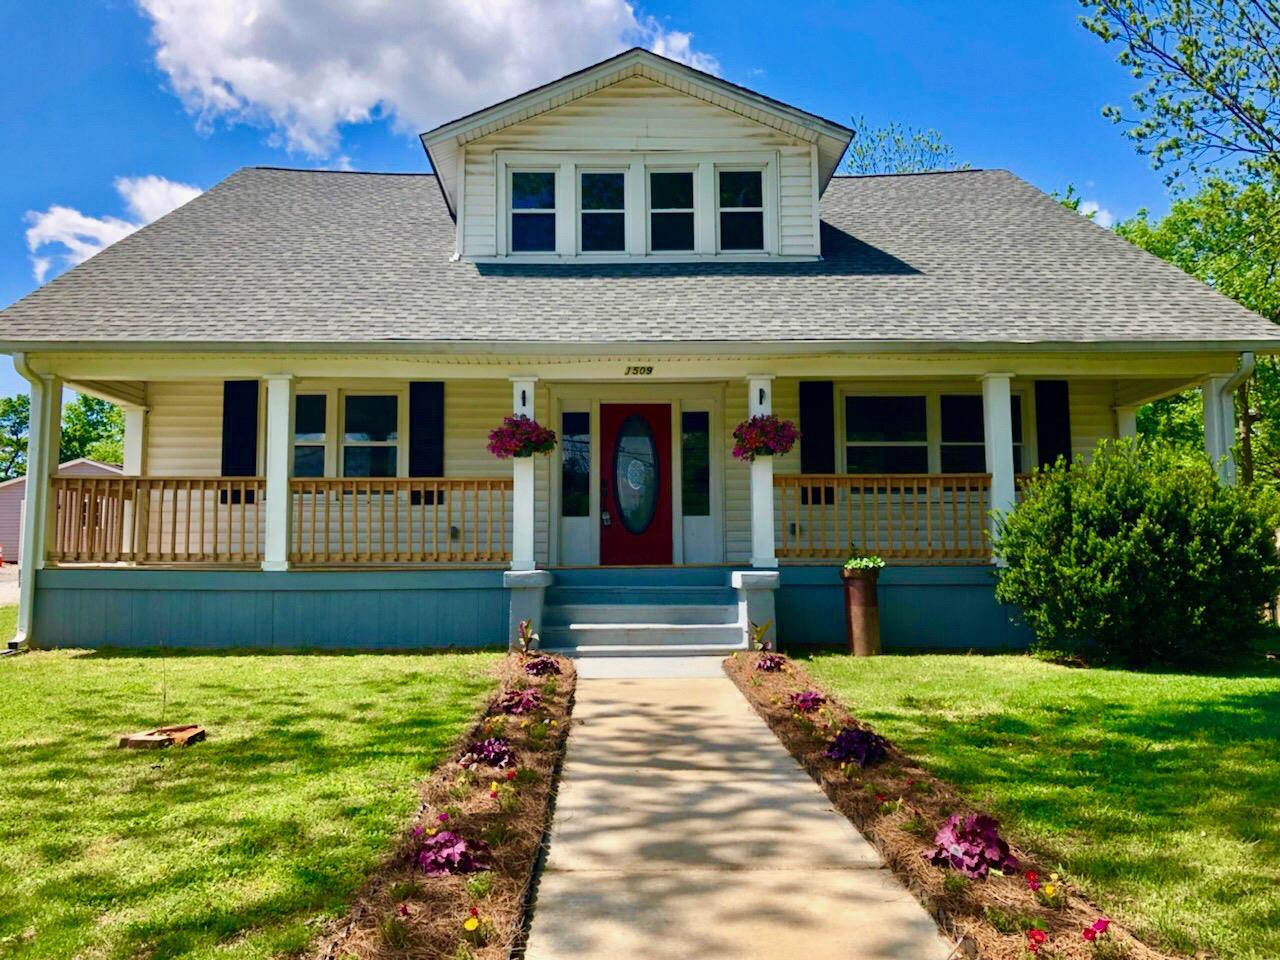 1509 S Main St, Springfield, TN 37172 - Springfield, TN real estate listing